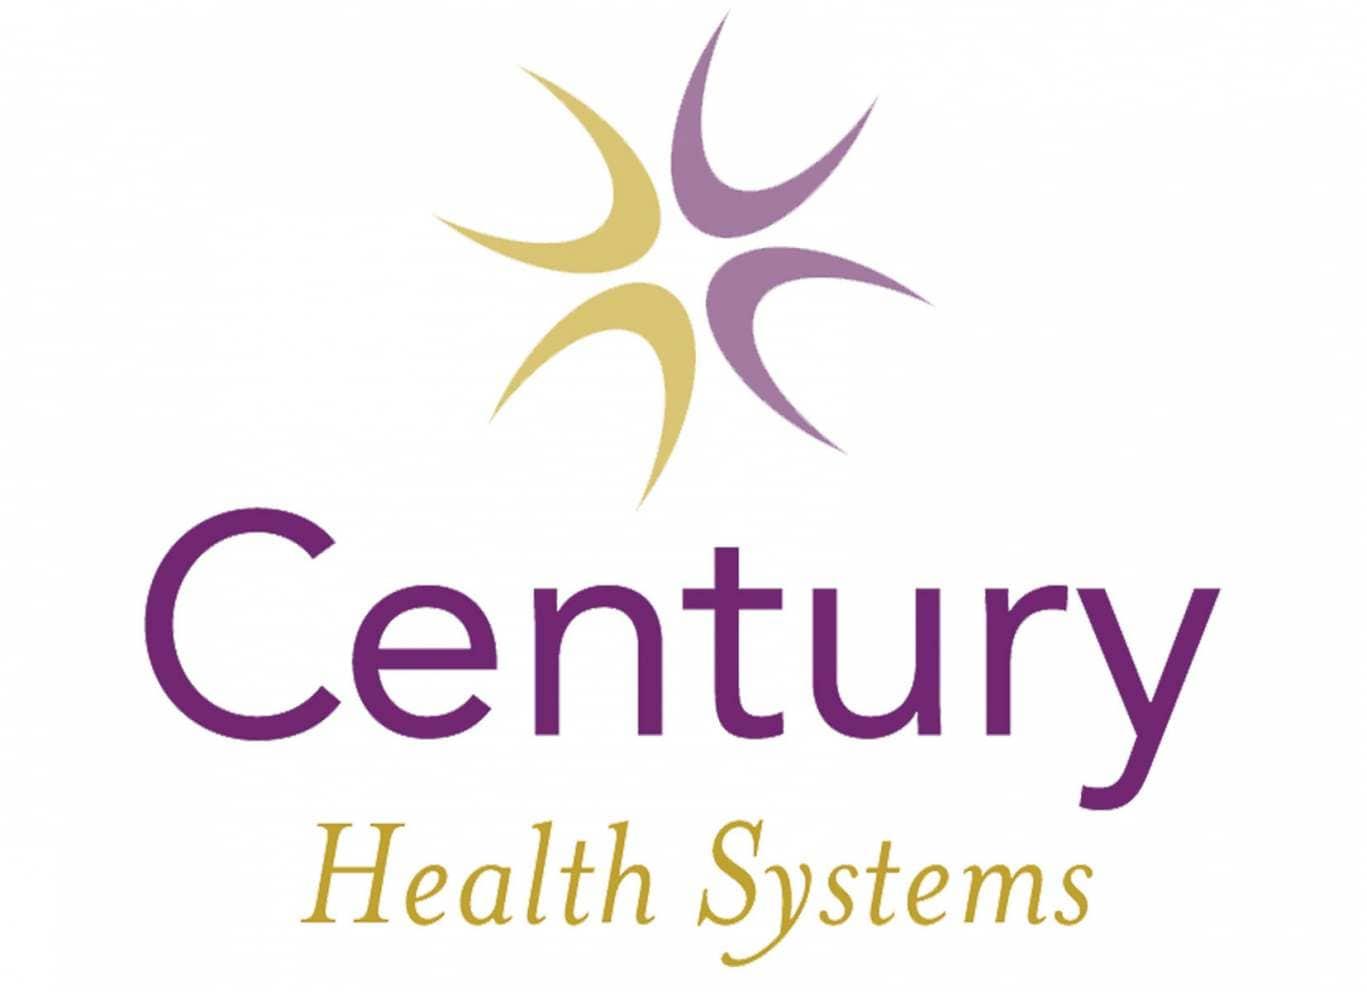 Century Health Systems healthcare logo